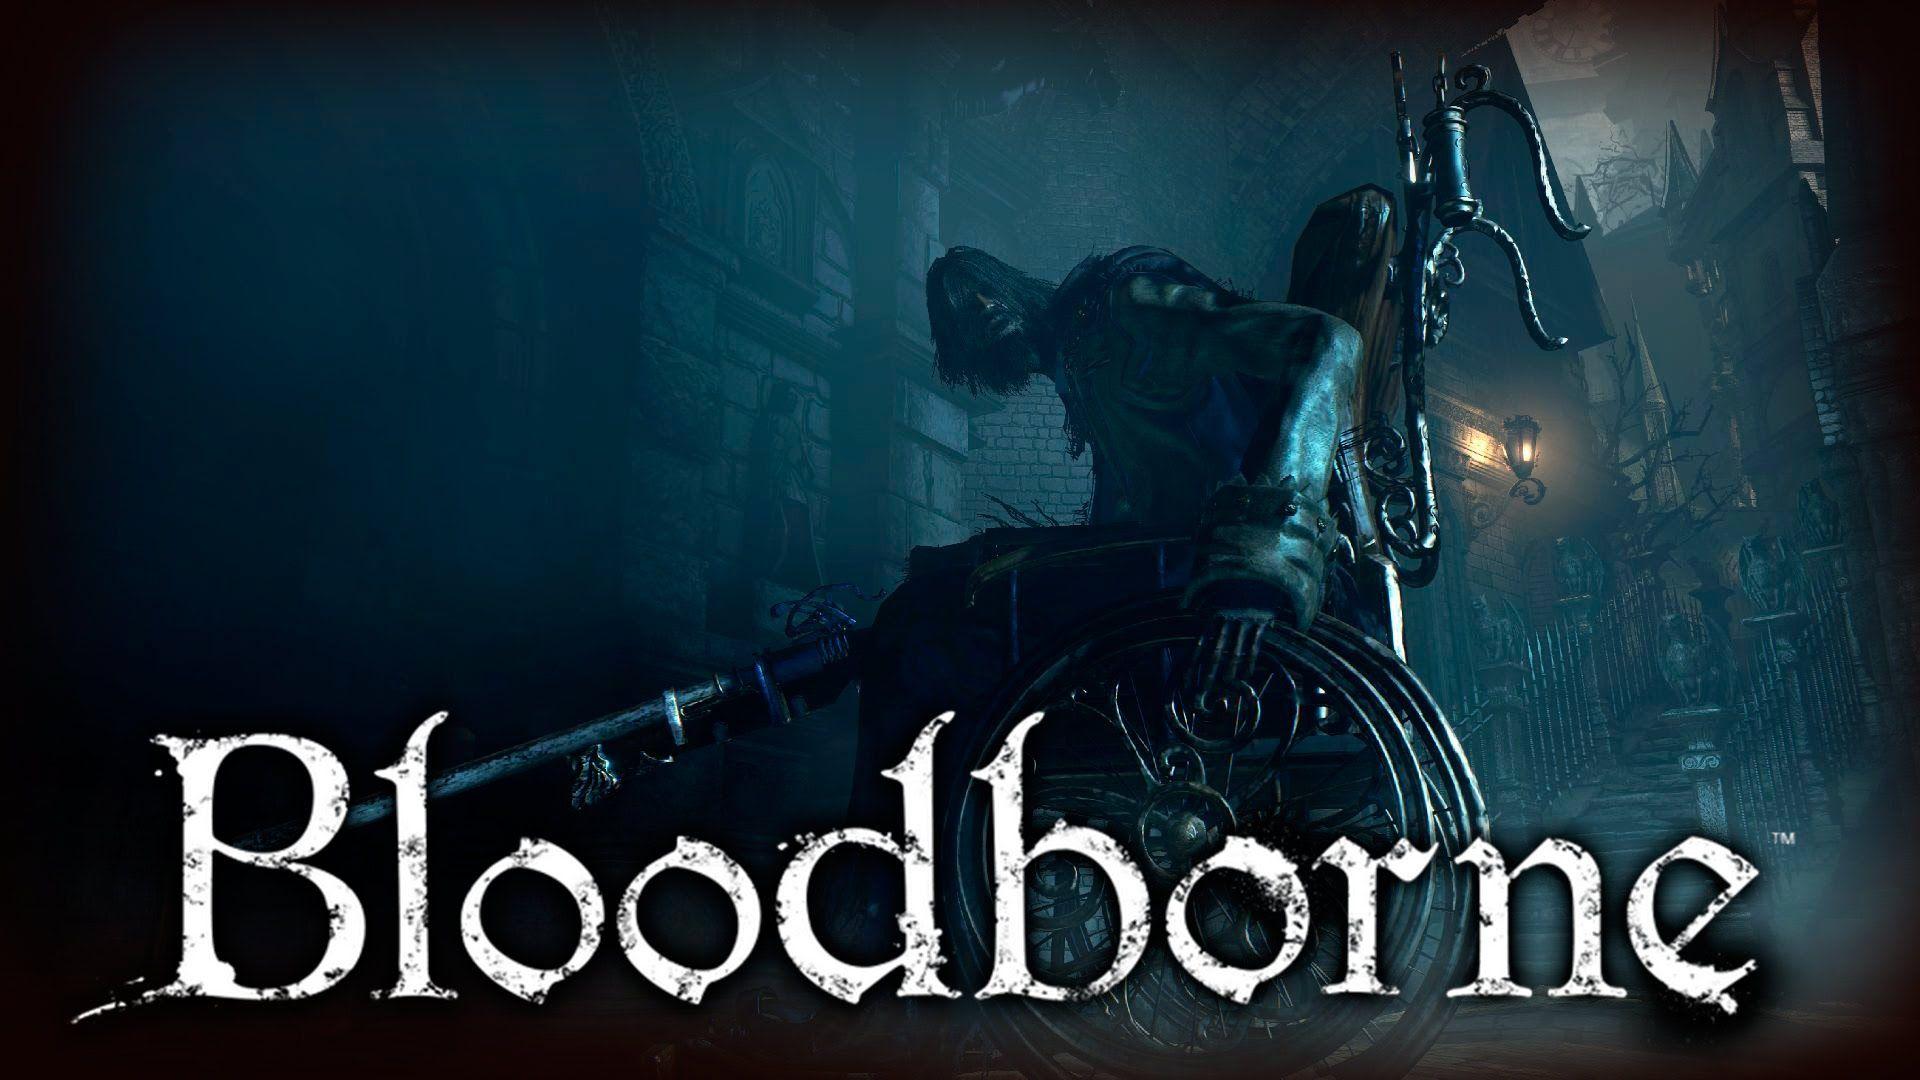 bloodborne video game wallpaper p